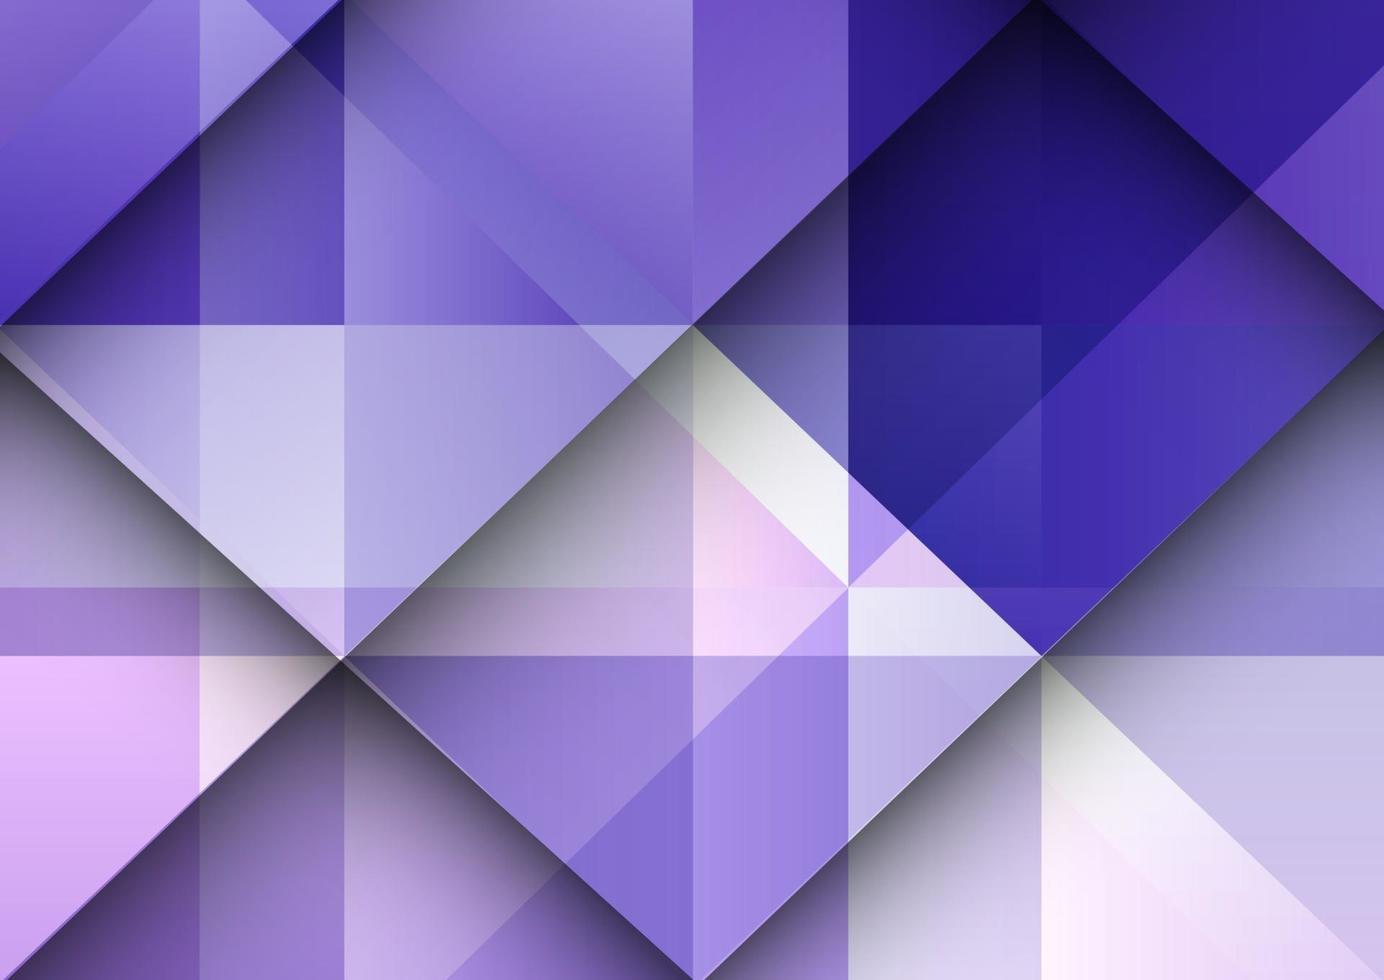 abstract geometrisch ontwerp als achtergrond vector